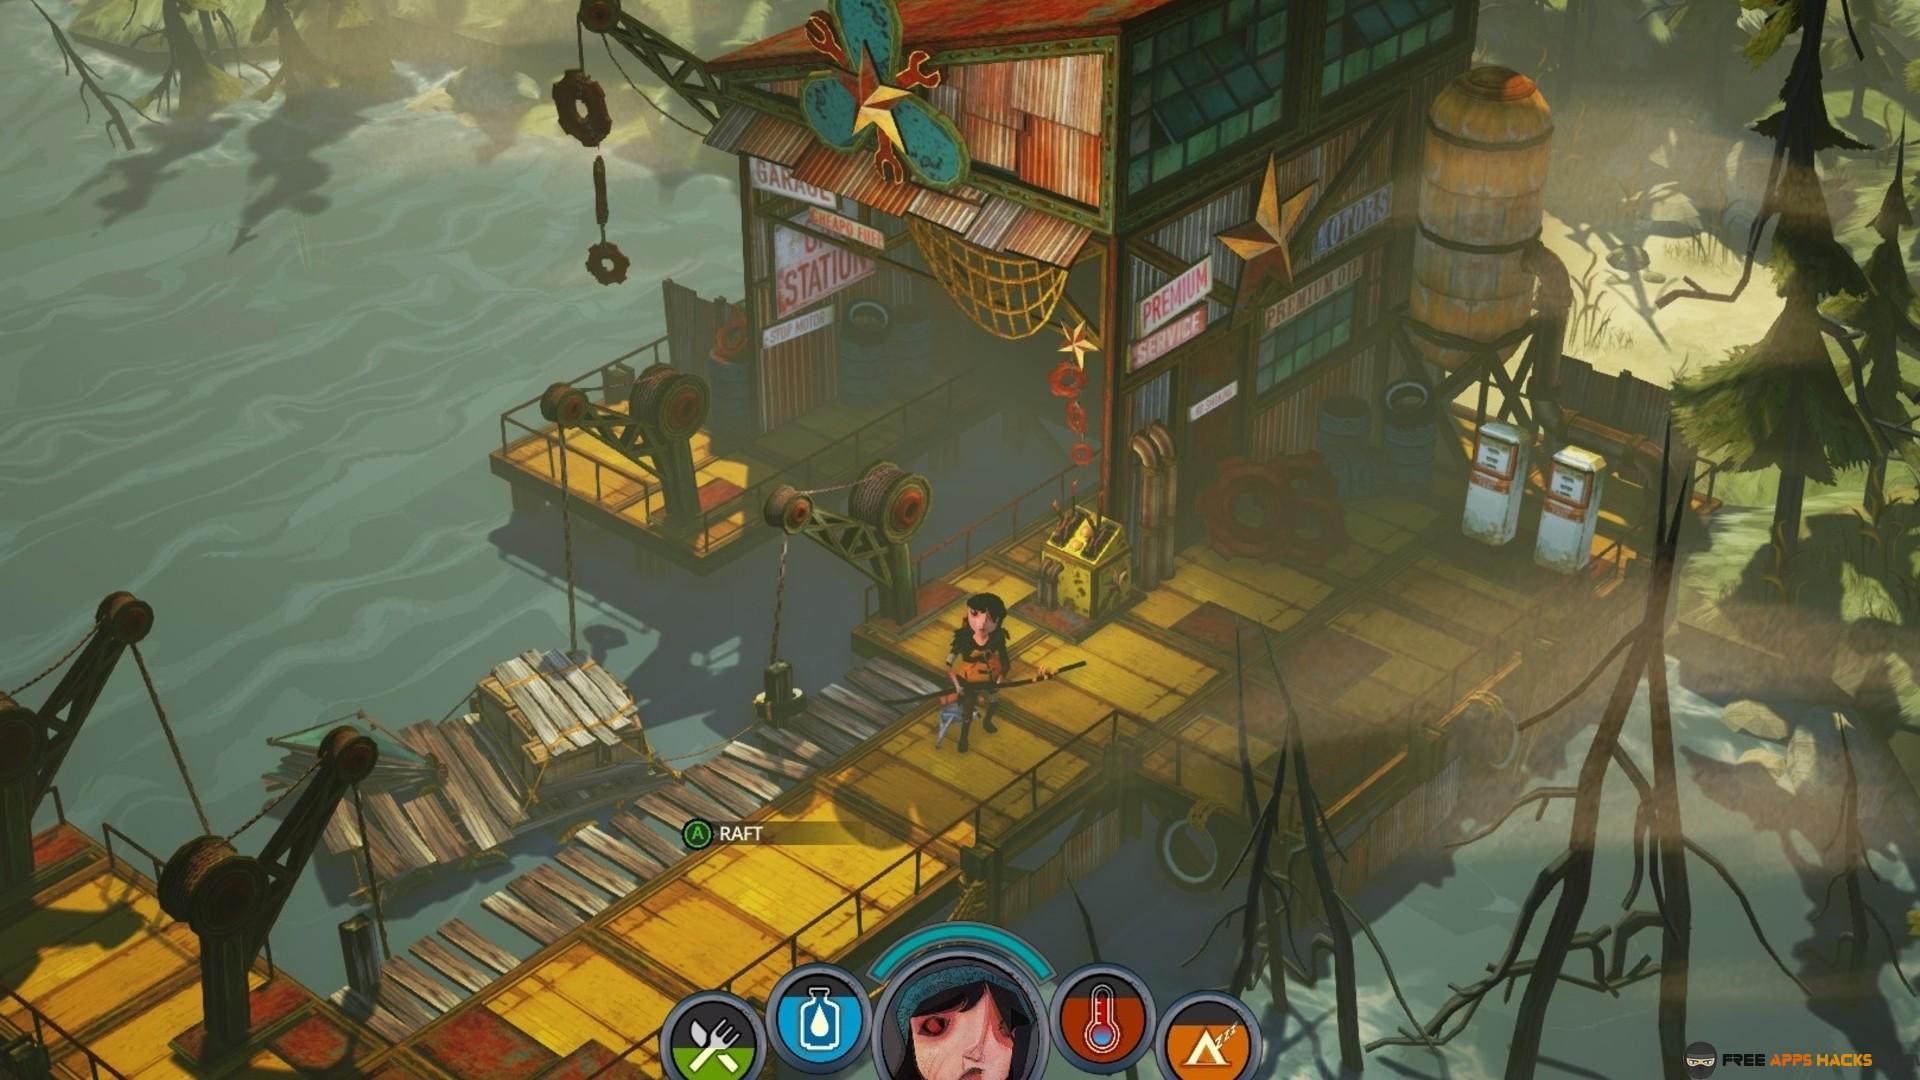 Raft Original Survival Game Mod APK - Free App Hacks